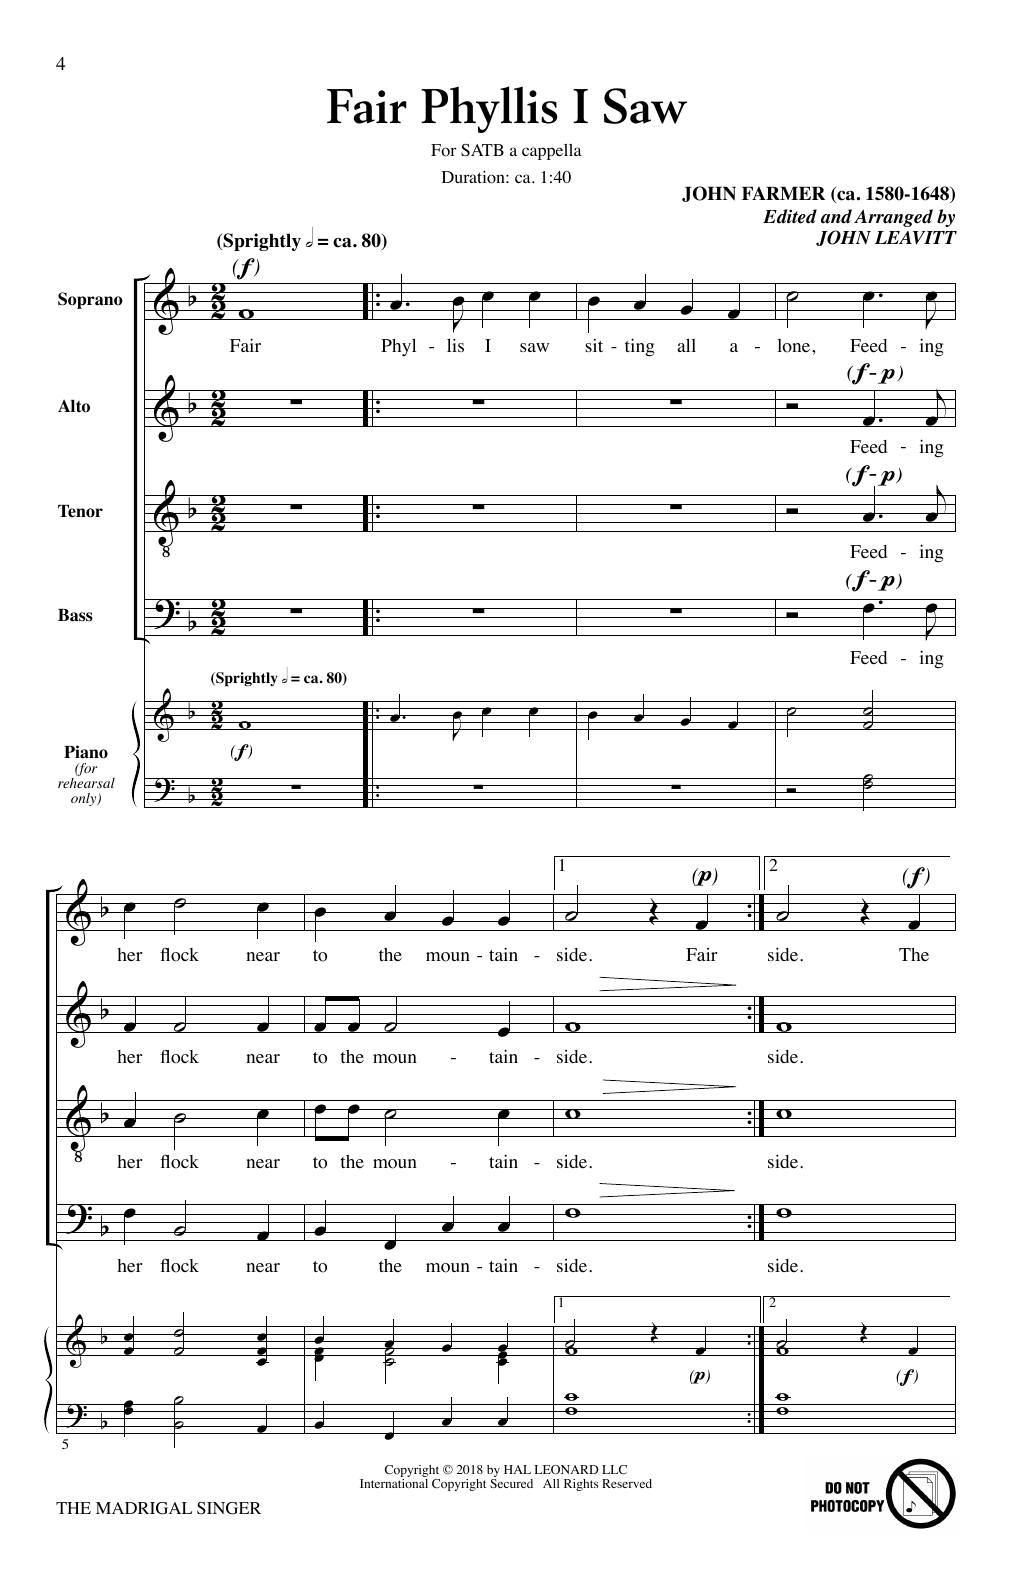 The Madrigal Singer